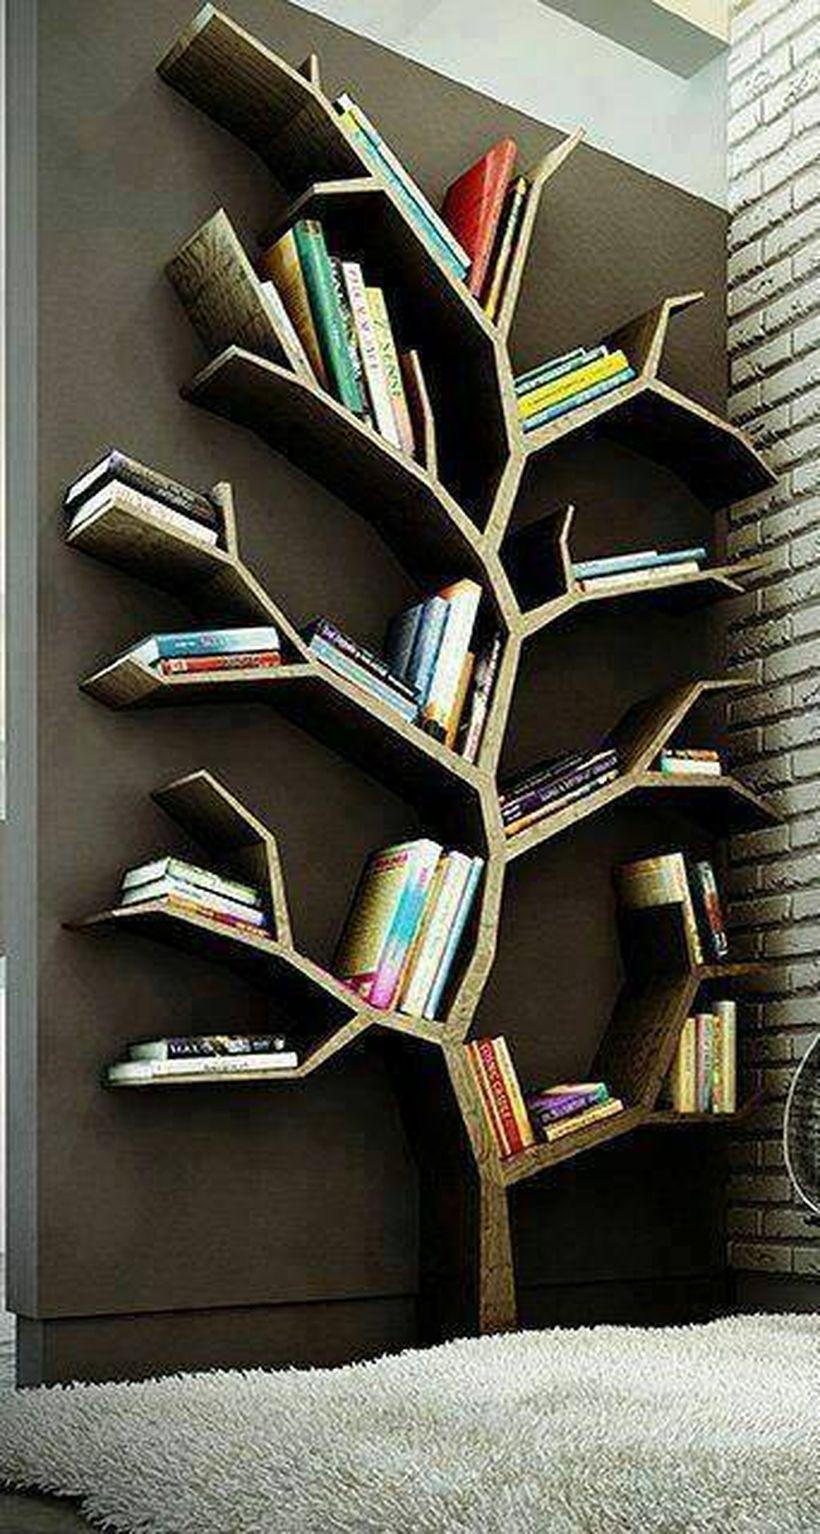 25 Stunning Creative Bookshelves Design Ideas | Bookshelf design ...